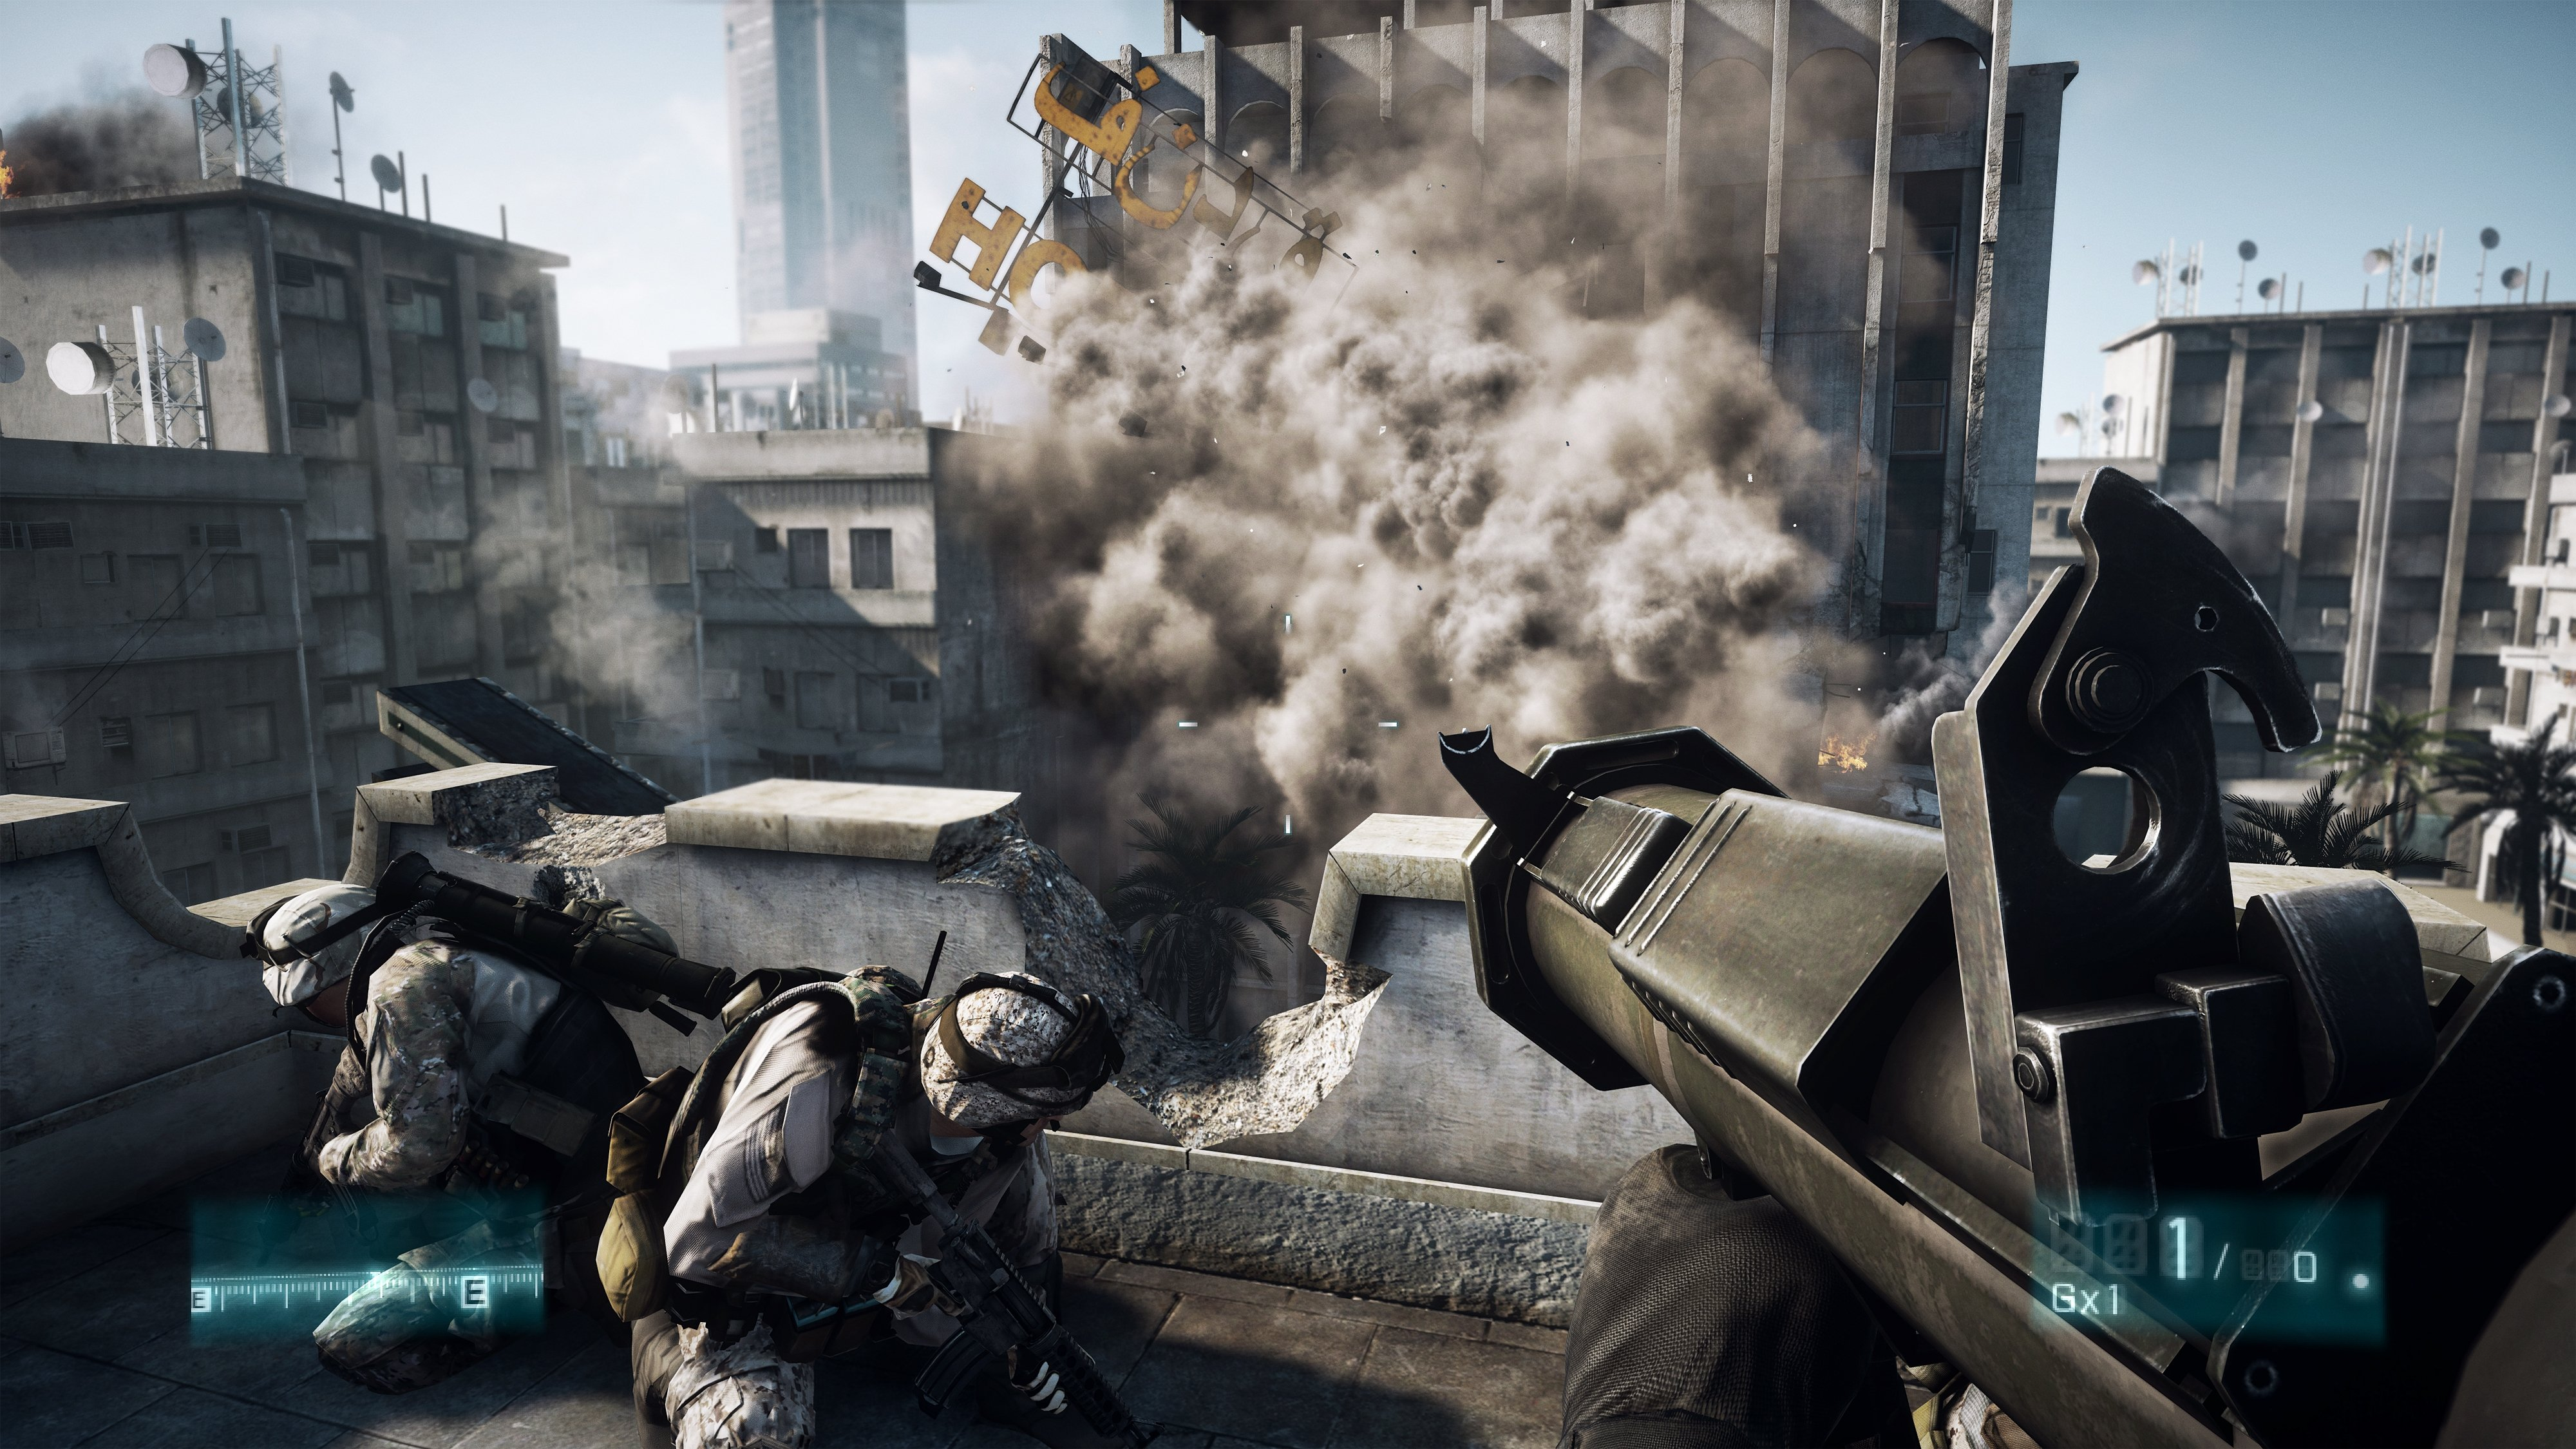 Battlefield 3 image 8